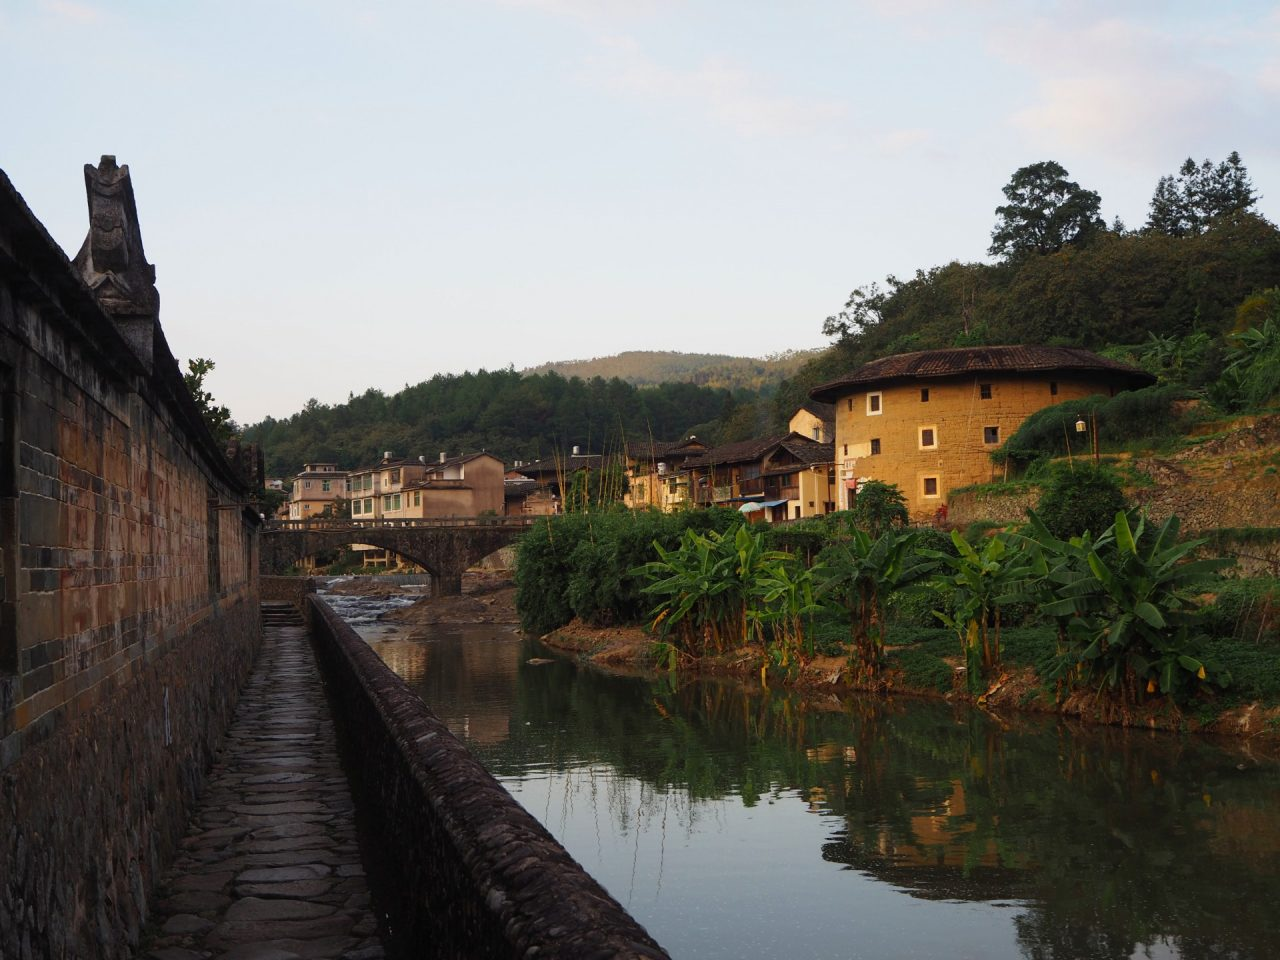 River Tulou